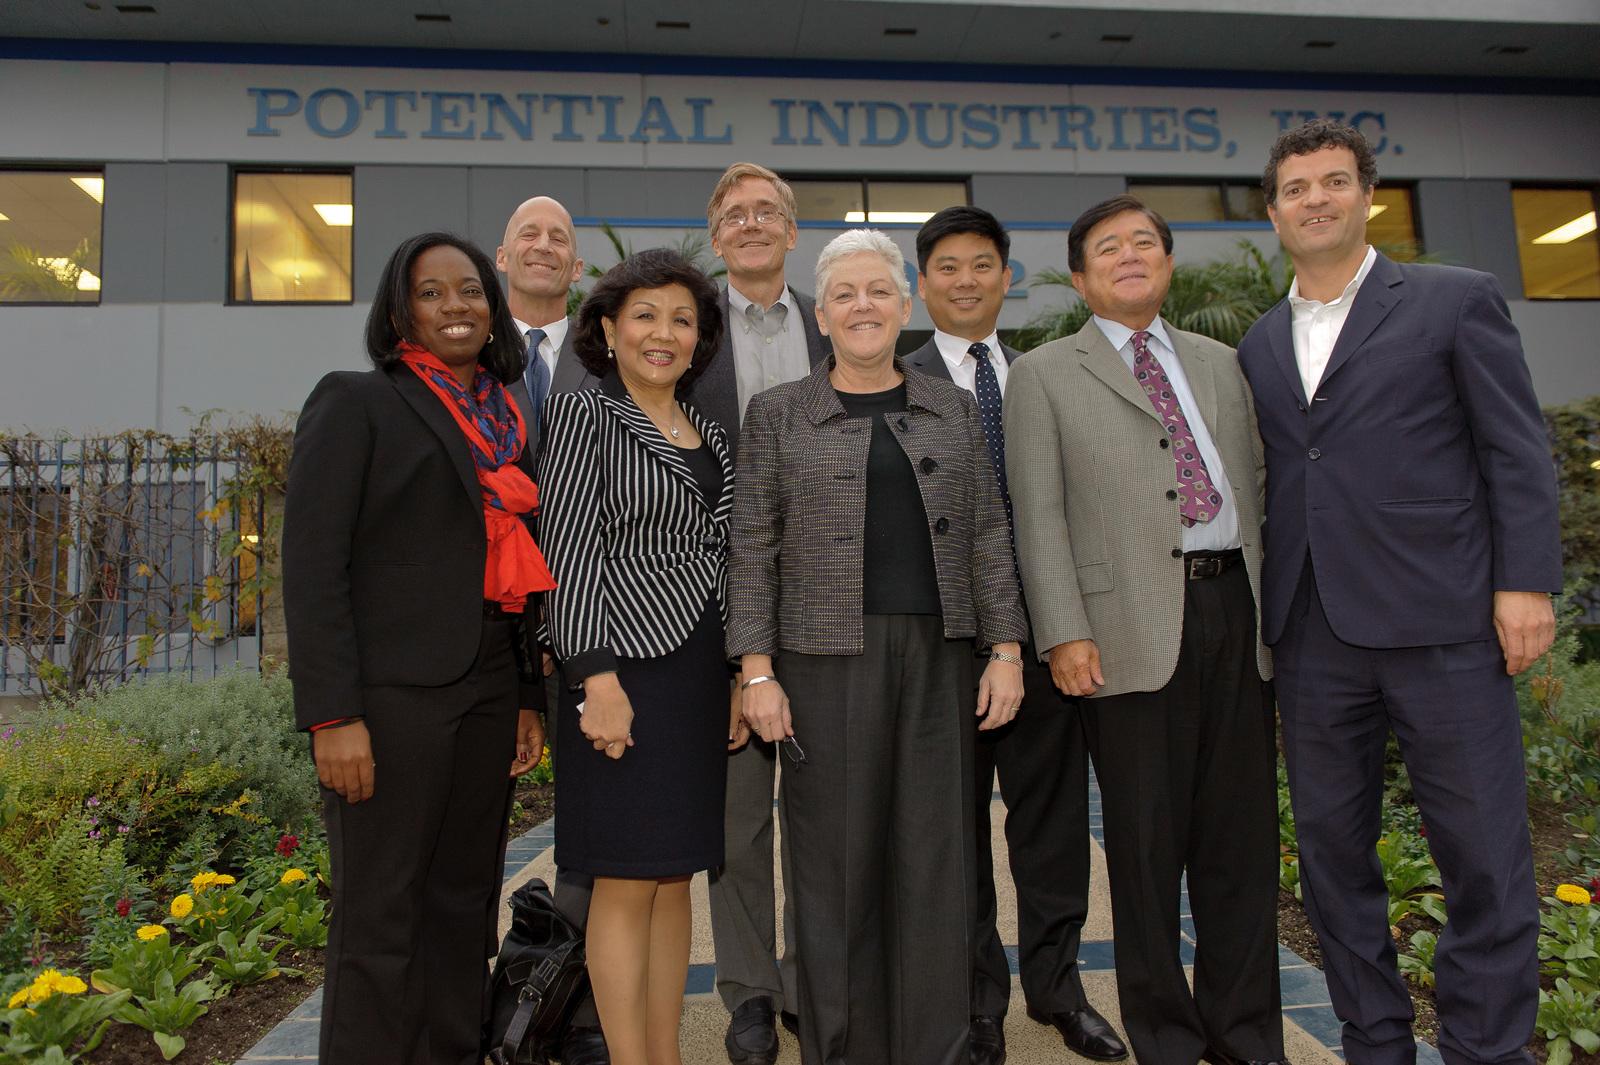 Office of the Administrator - Los Angeles, California [412-APD-1168-2013-11-21_LA_128.jpg]